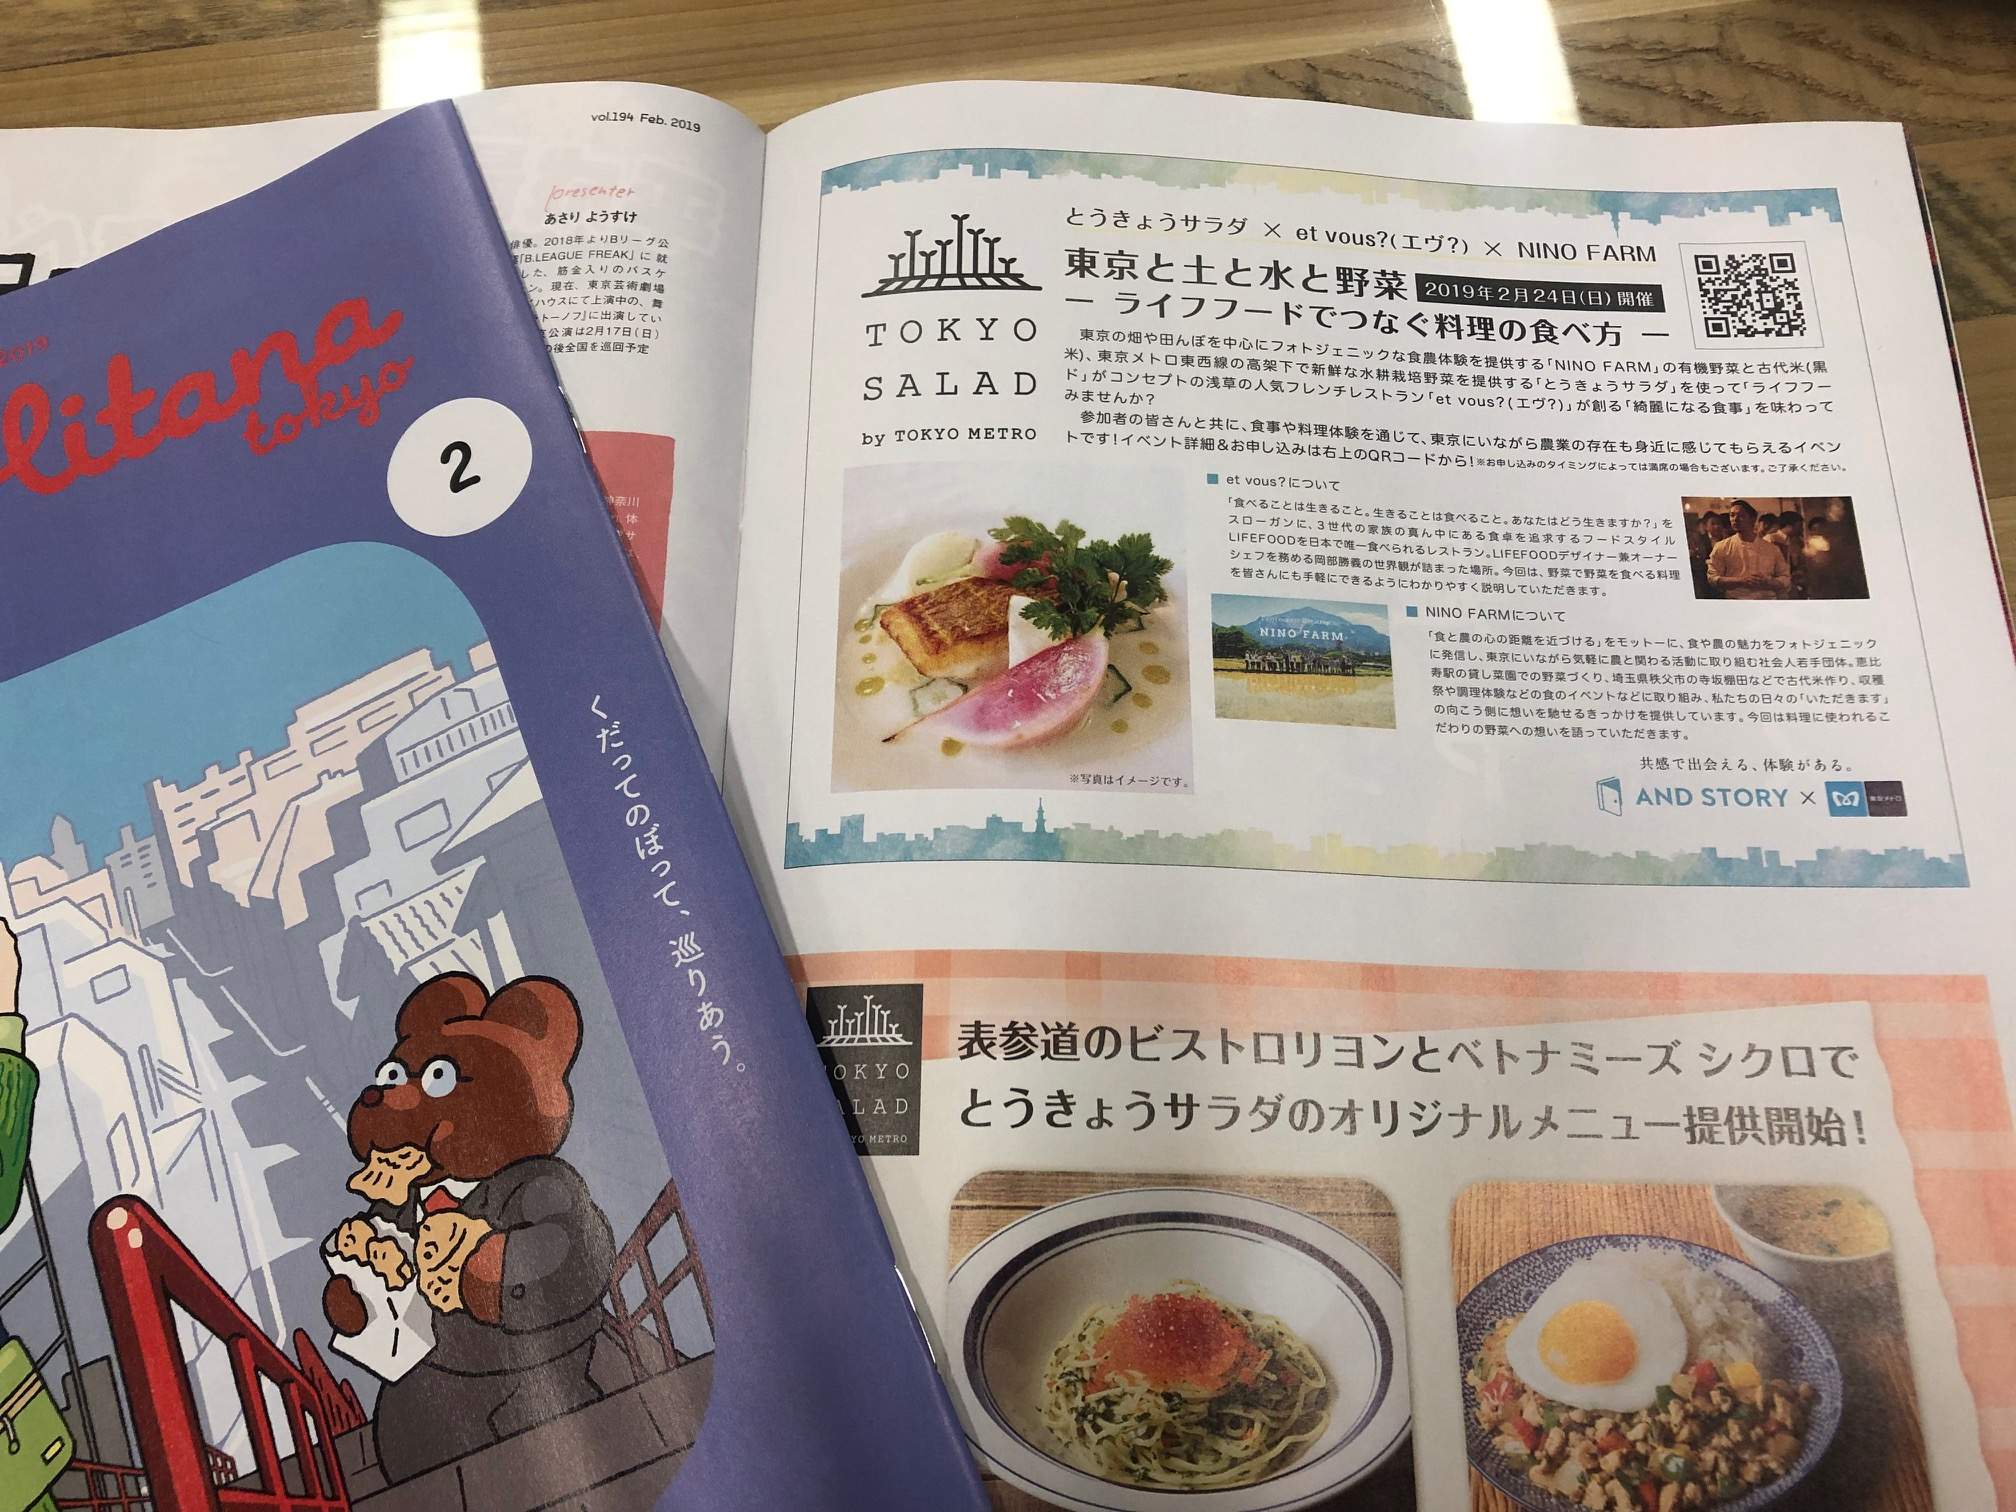 【AND STORY】東京メトロがホストとなって体験提供を開始。